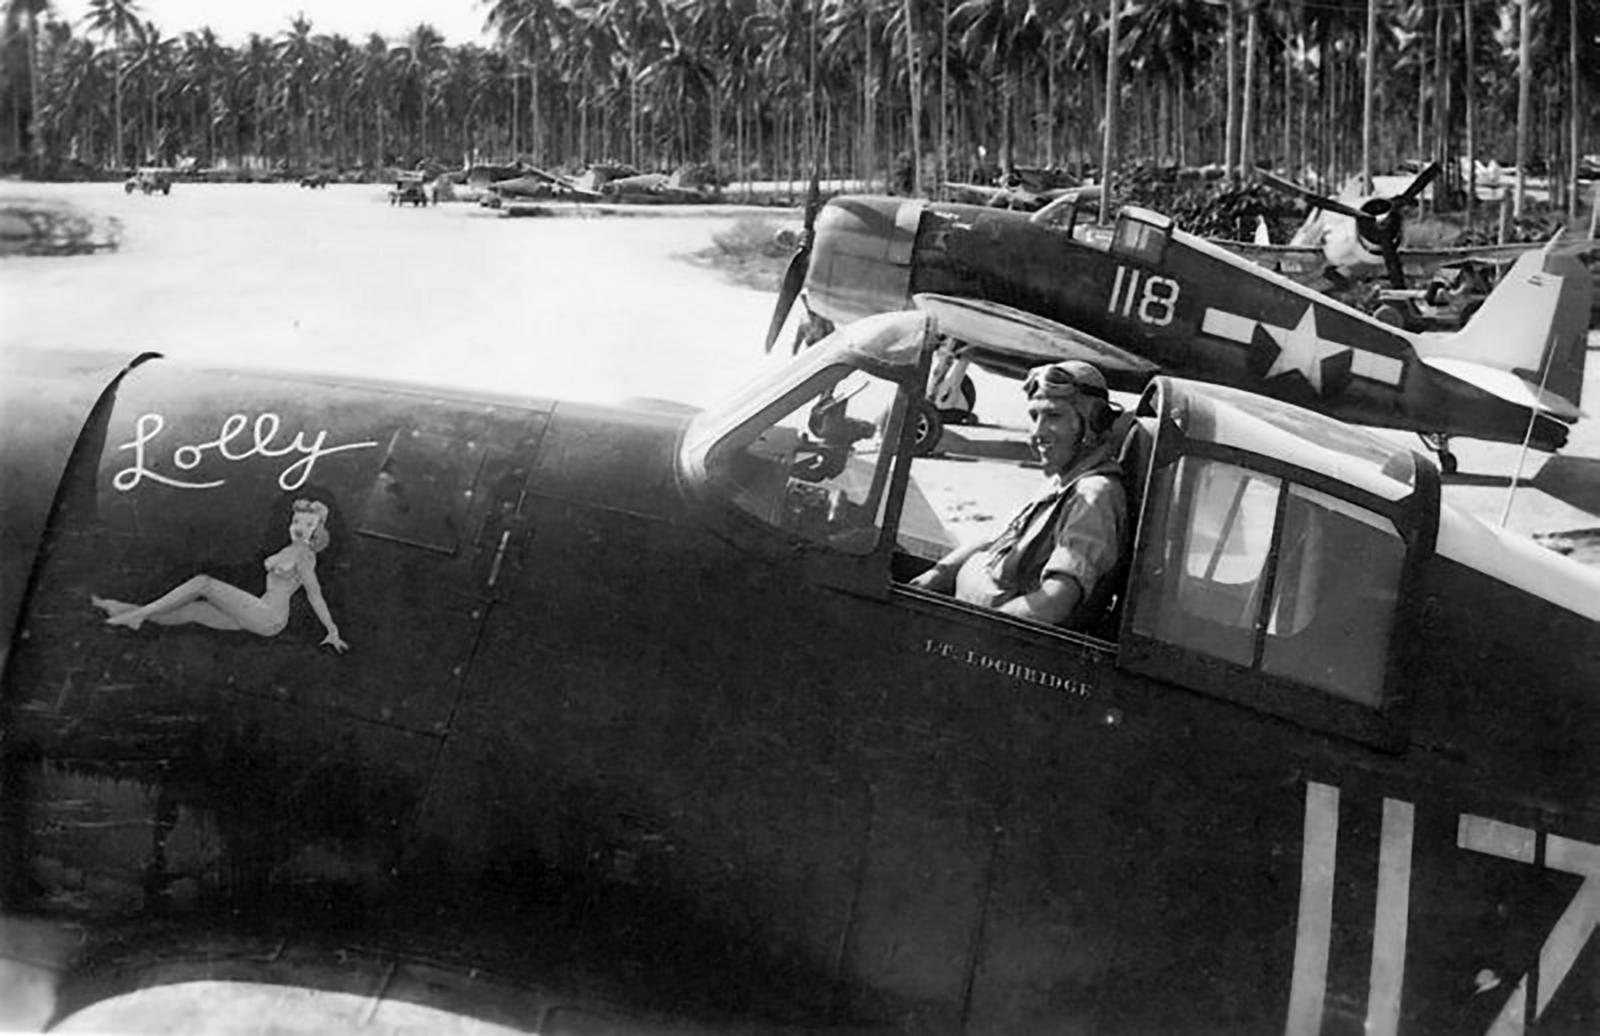 Grumman F6F 3 Hellcat VF 38 White 118 at Munda airfield New Georgia Sep 1943 01